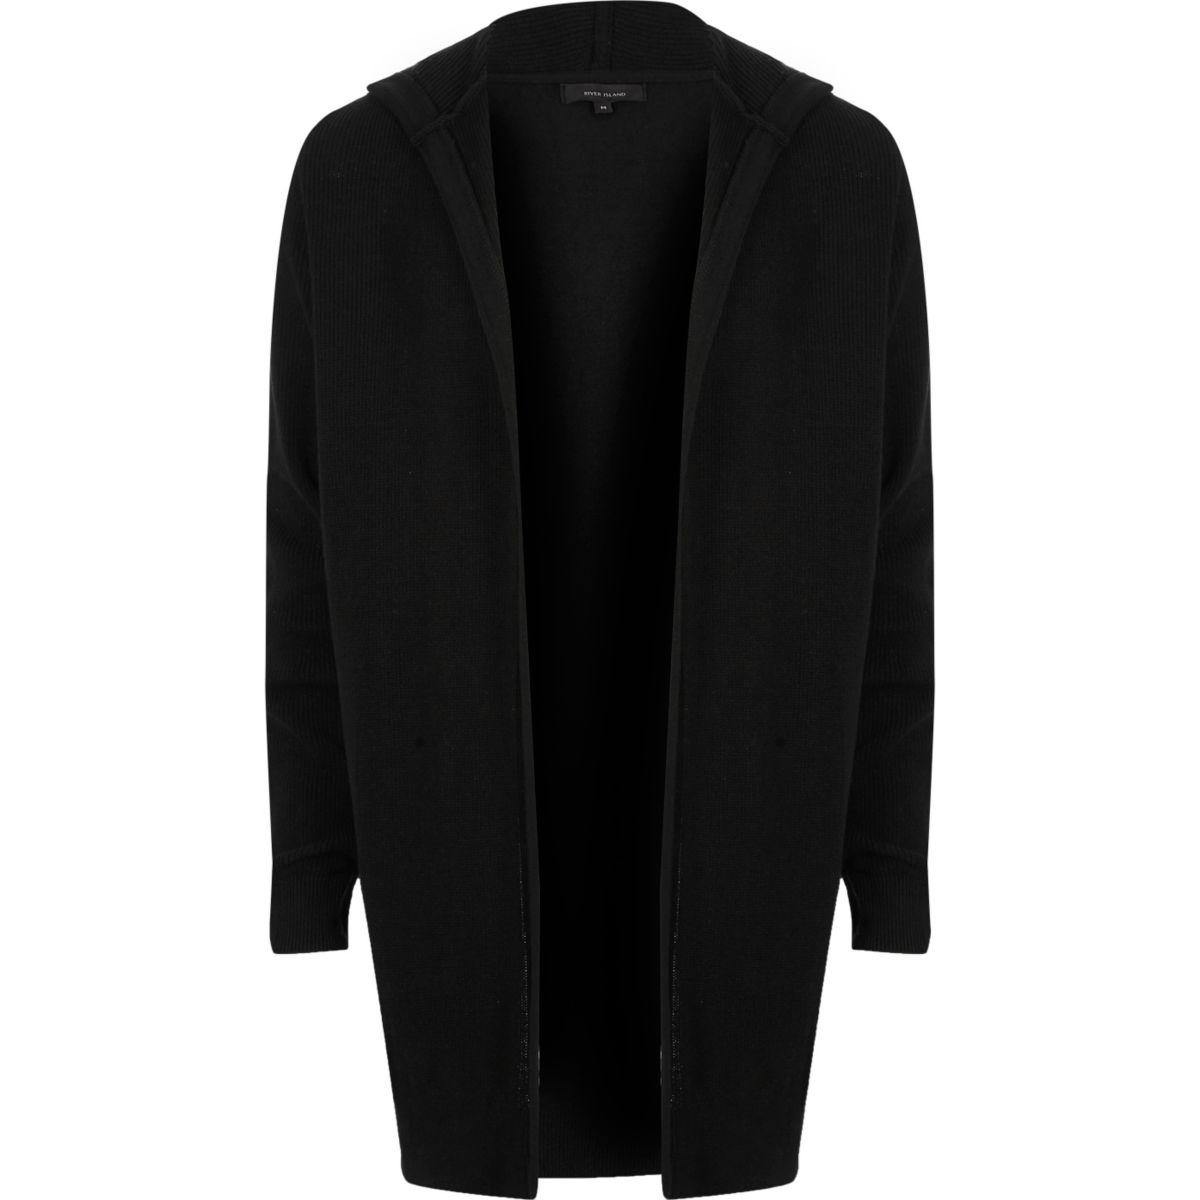 Black hooded longline cardigan